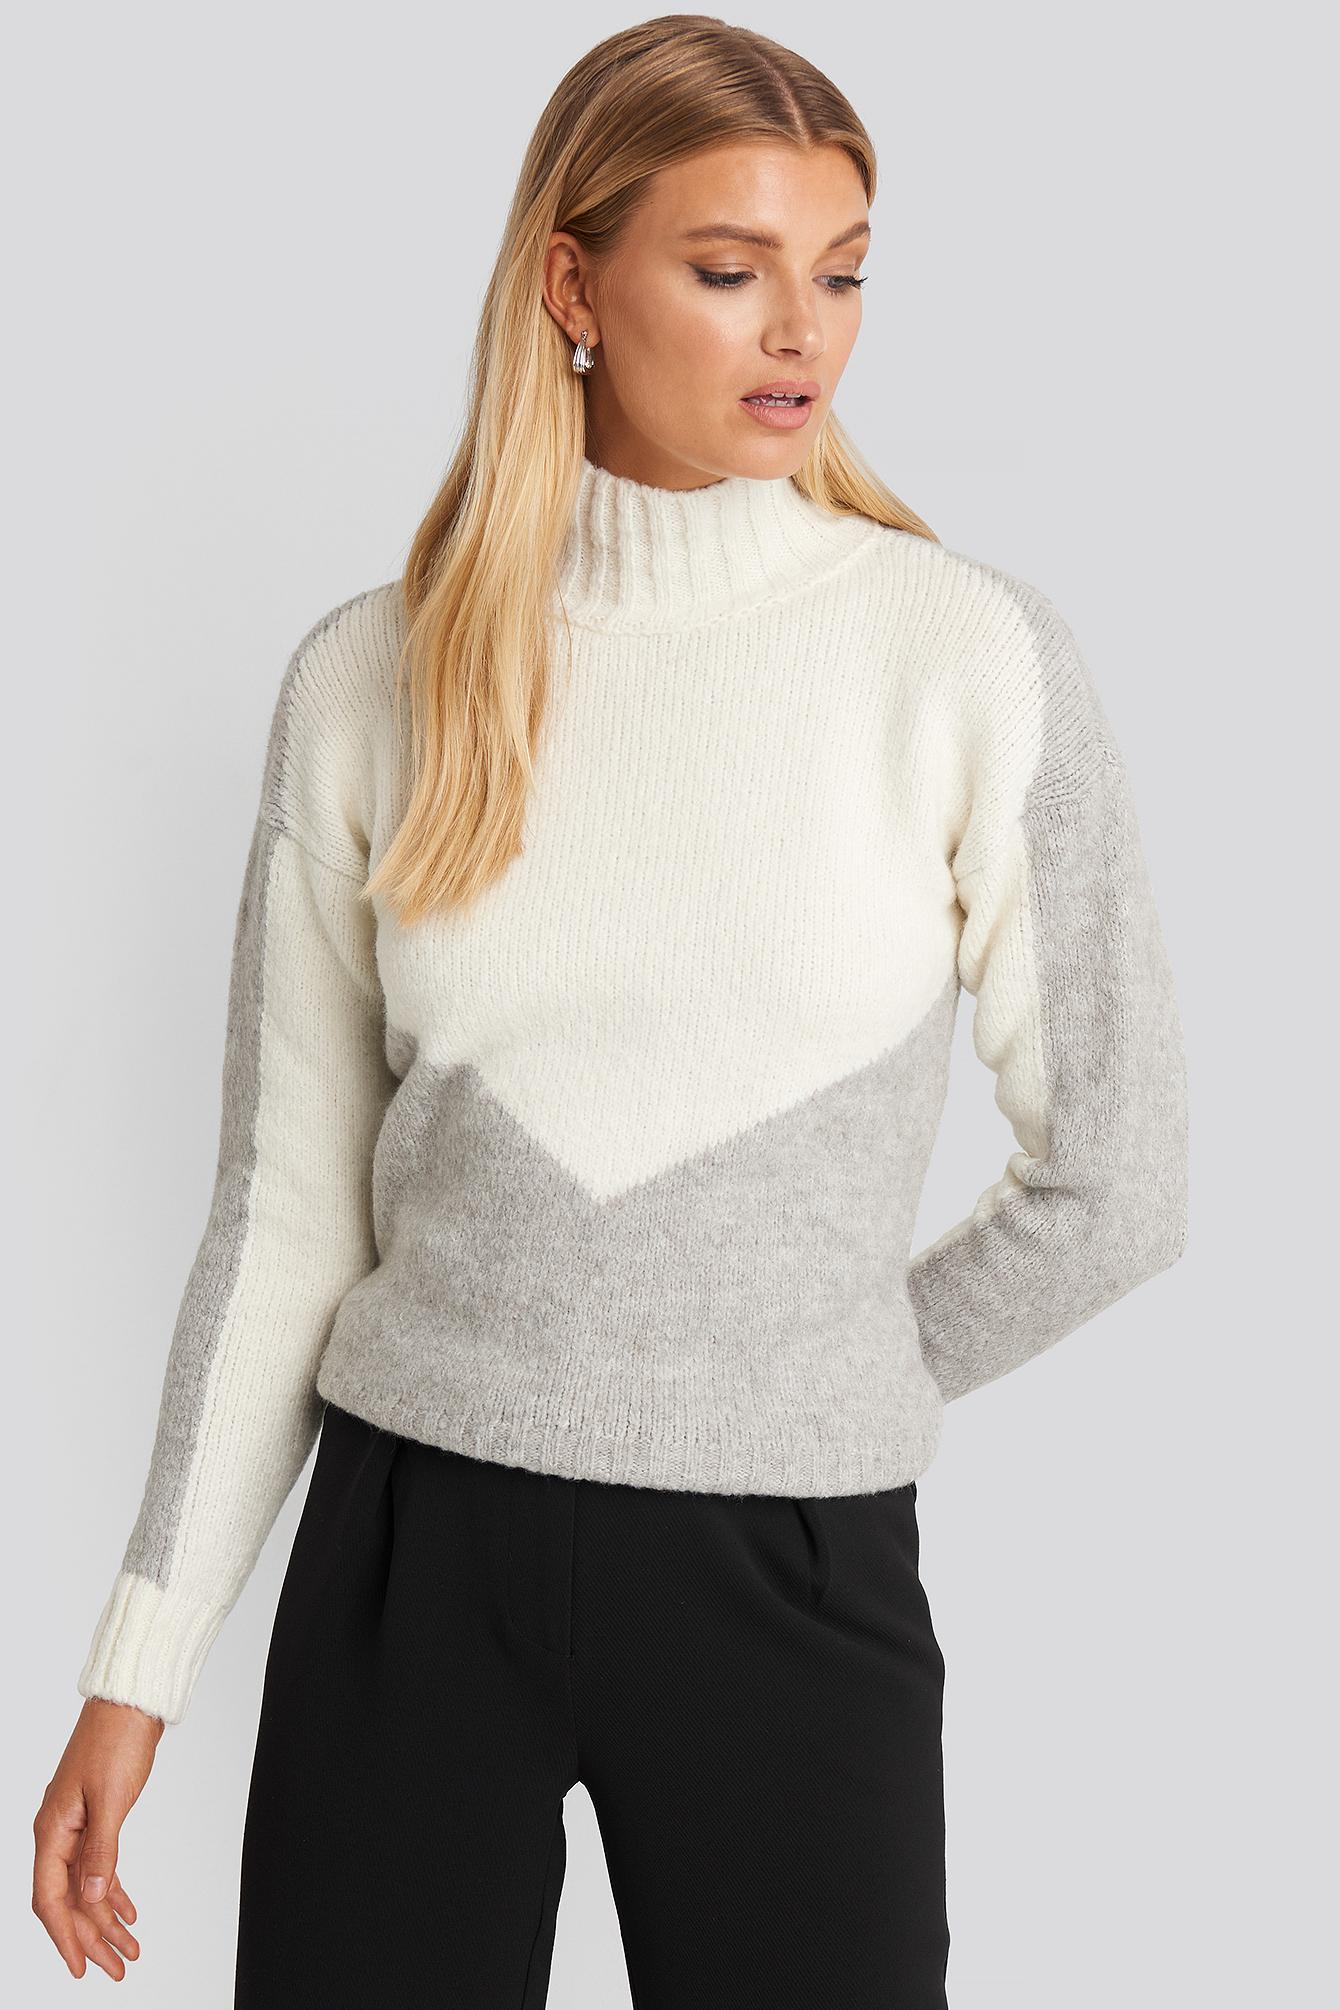 Turtleneck Colorblock Sweater Blanc by Trendyol